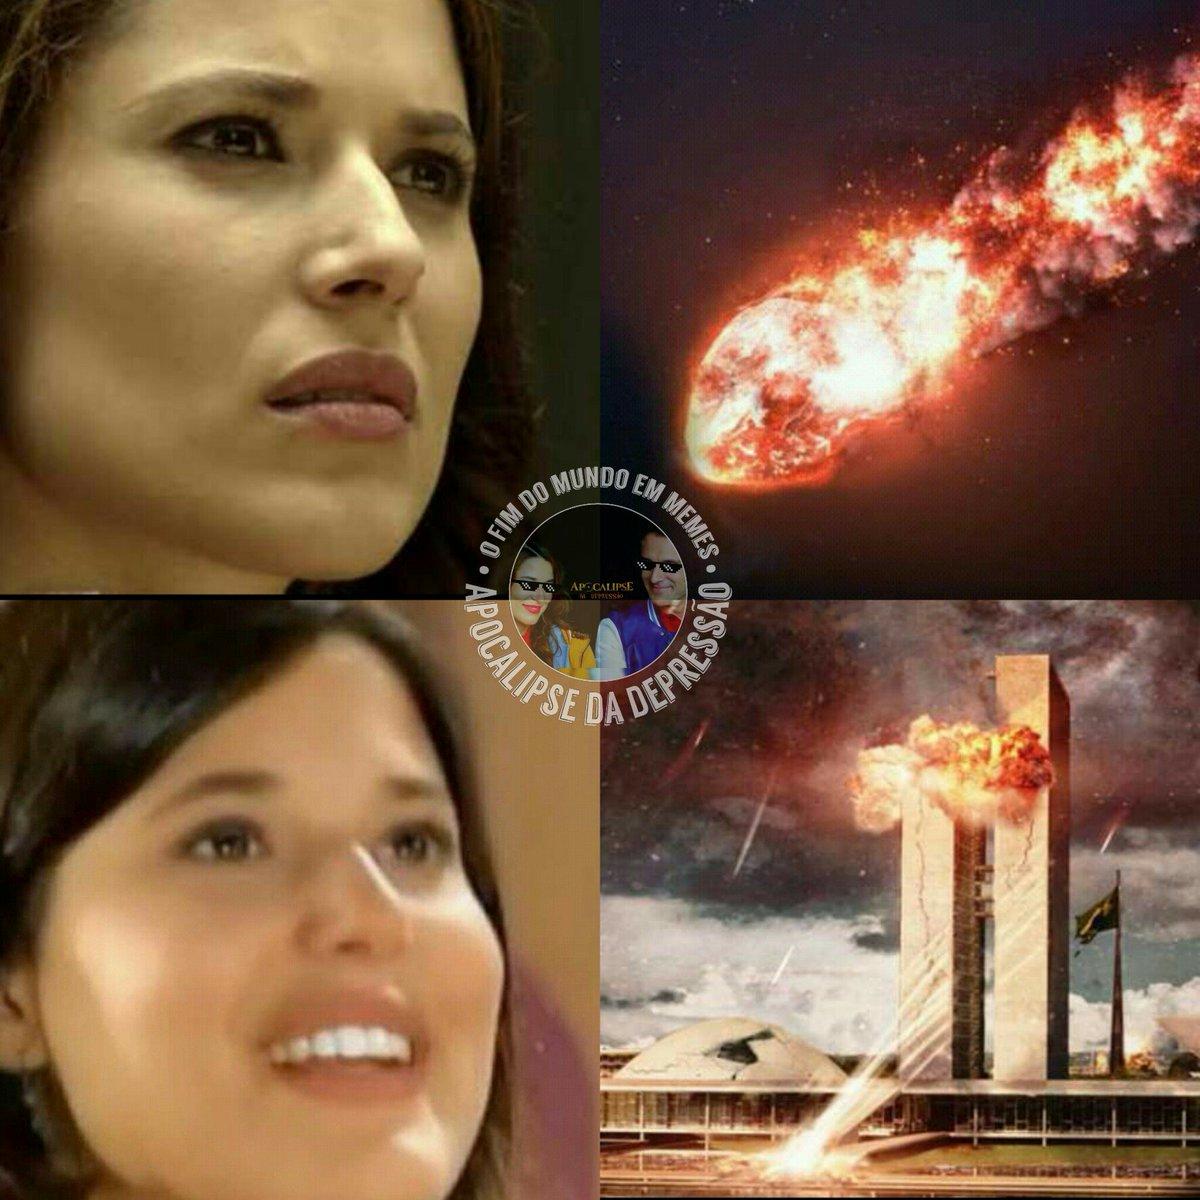 #Apocalipse39 Latest News Trends Updates Images - APCdaDepressao